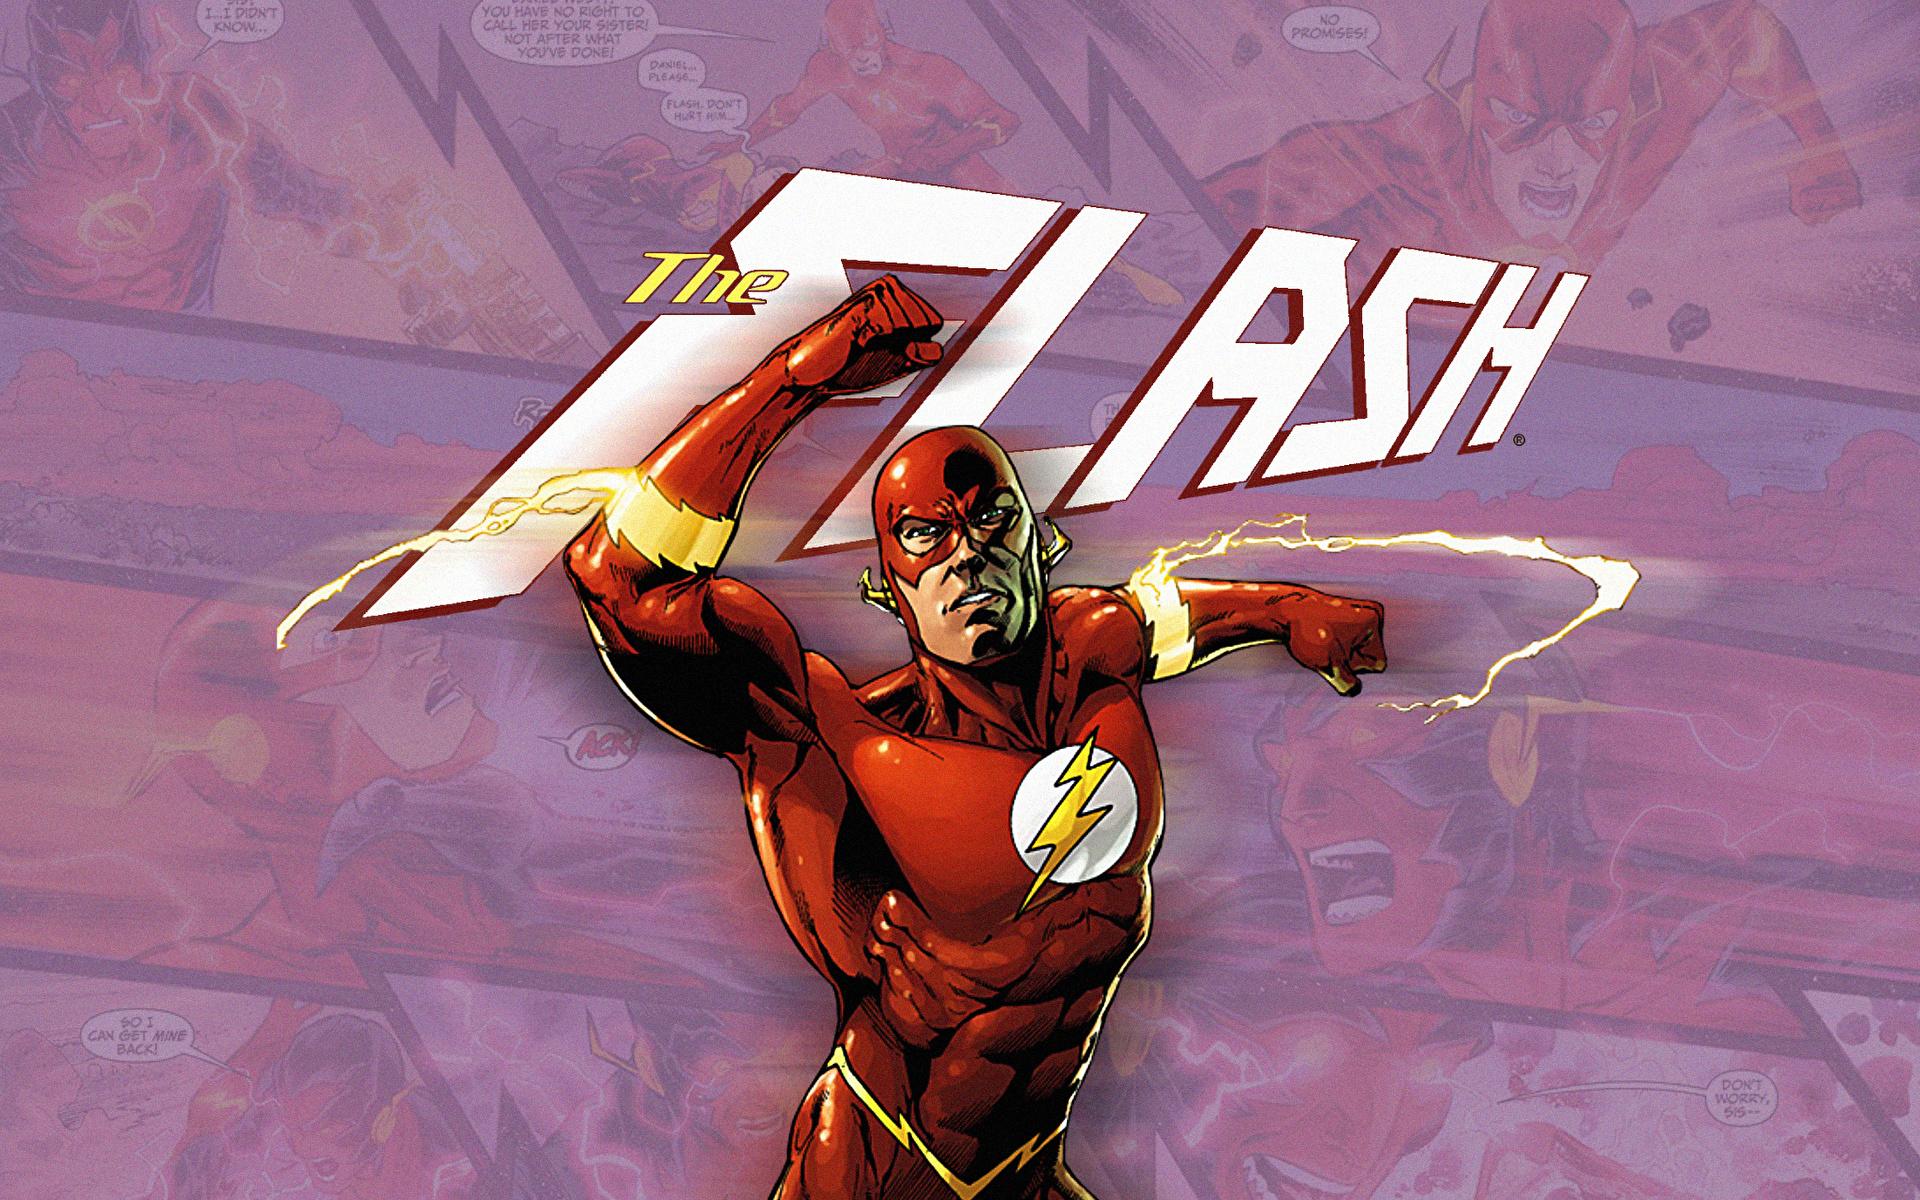 Pictures Heroes comics The Flash hero Men film 1920x1200 superheroes Man Movies